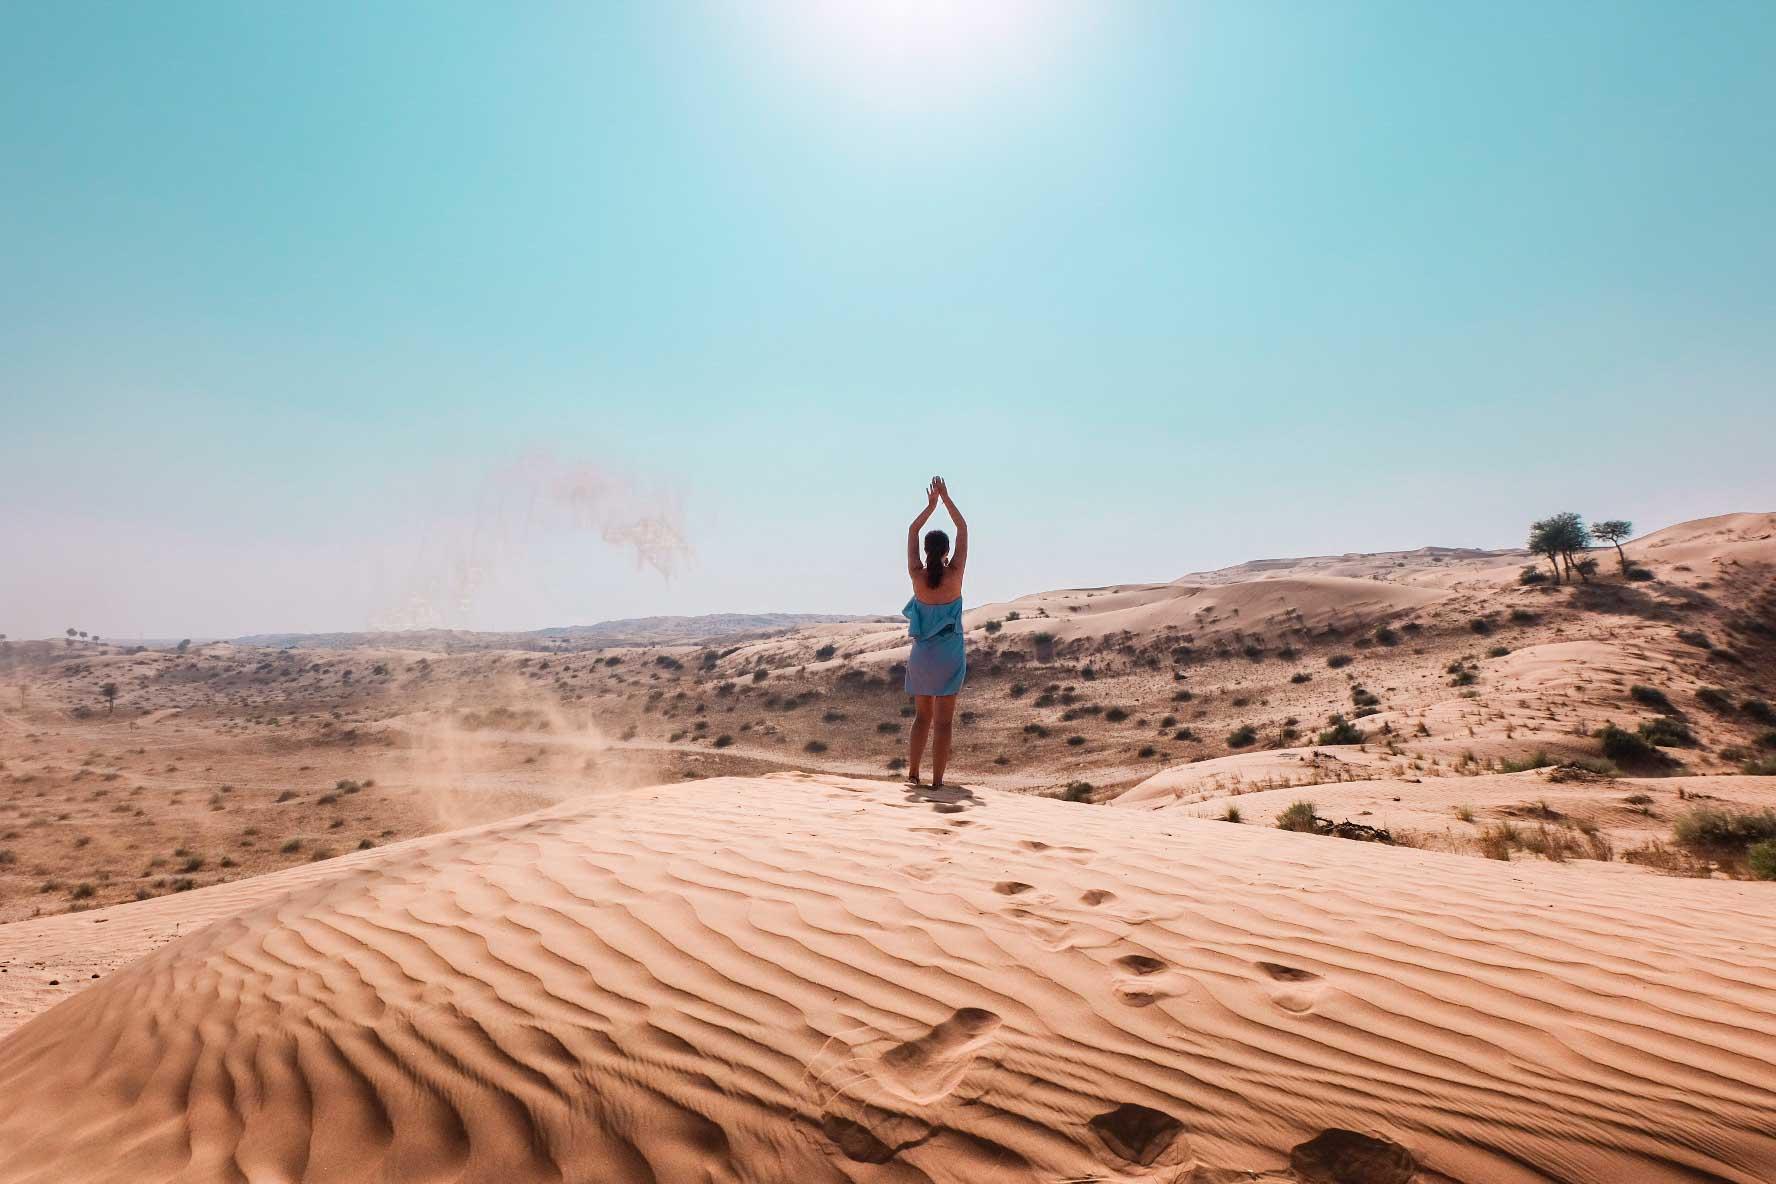 Ras Al Khaimah desert view